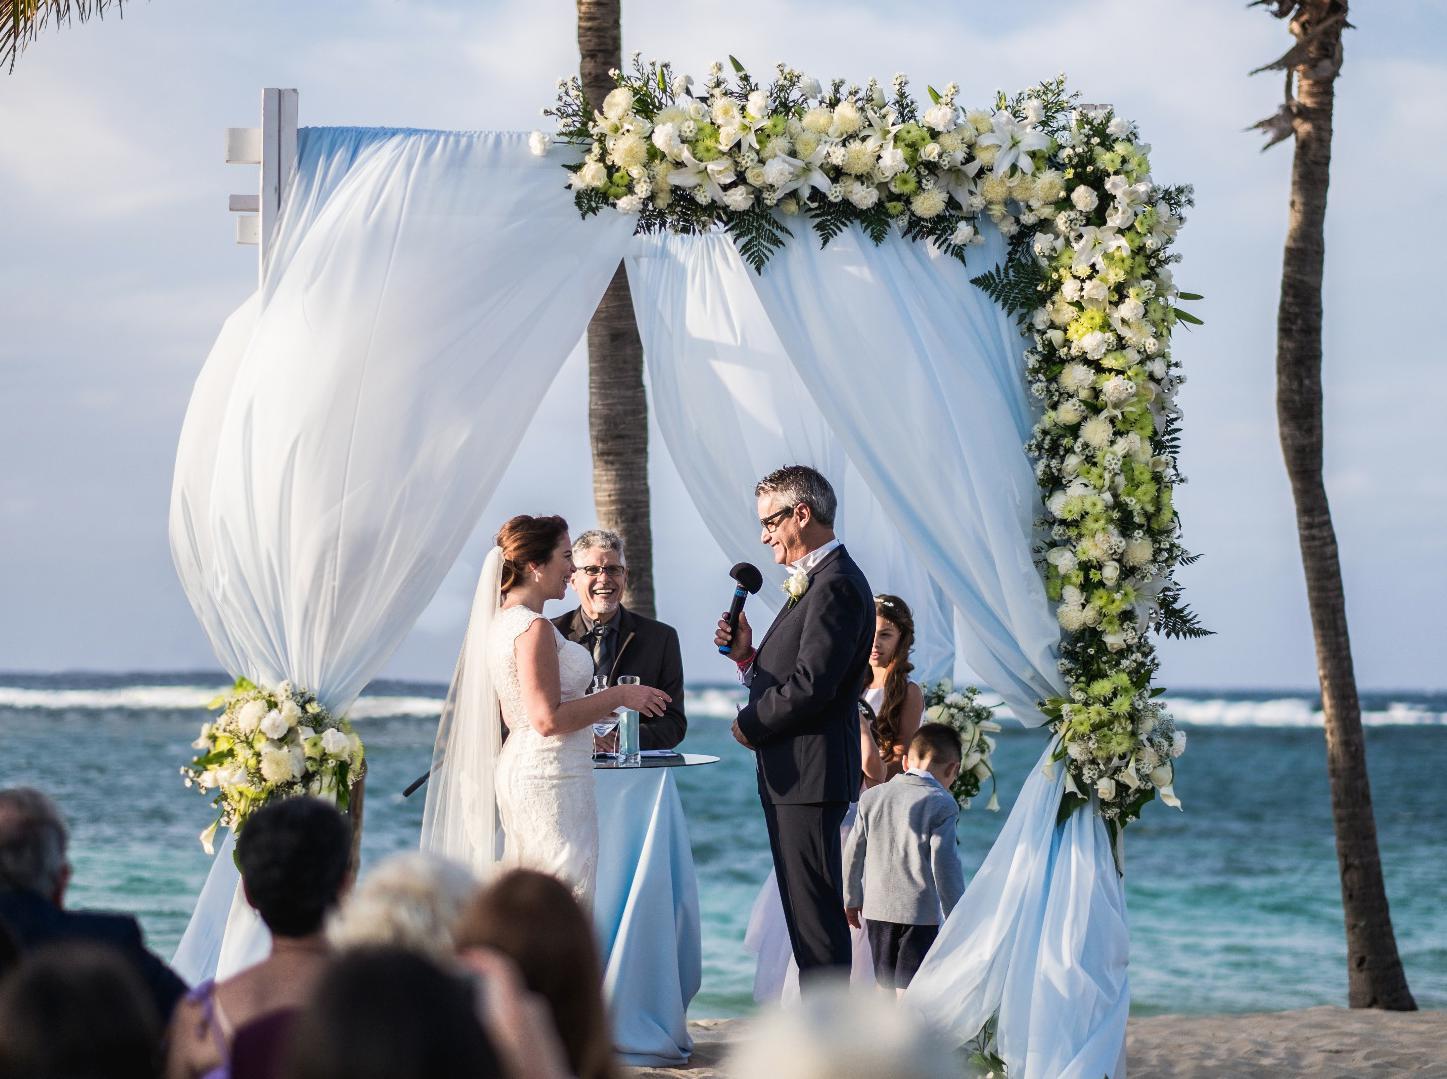 bodas-estilo-clasico-sin-tema-cuba-30802.jpg